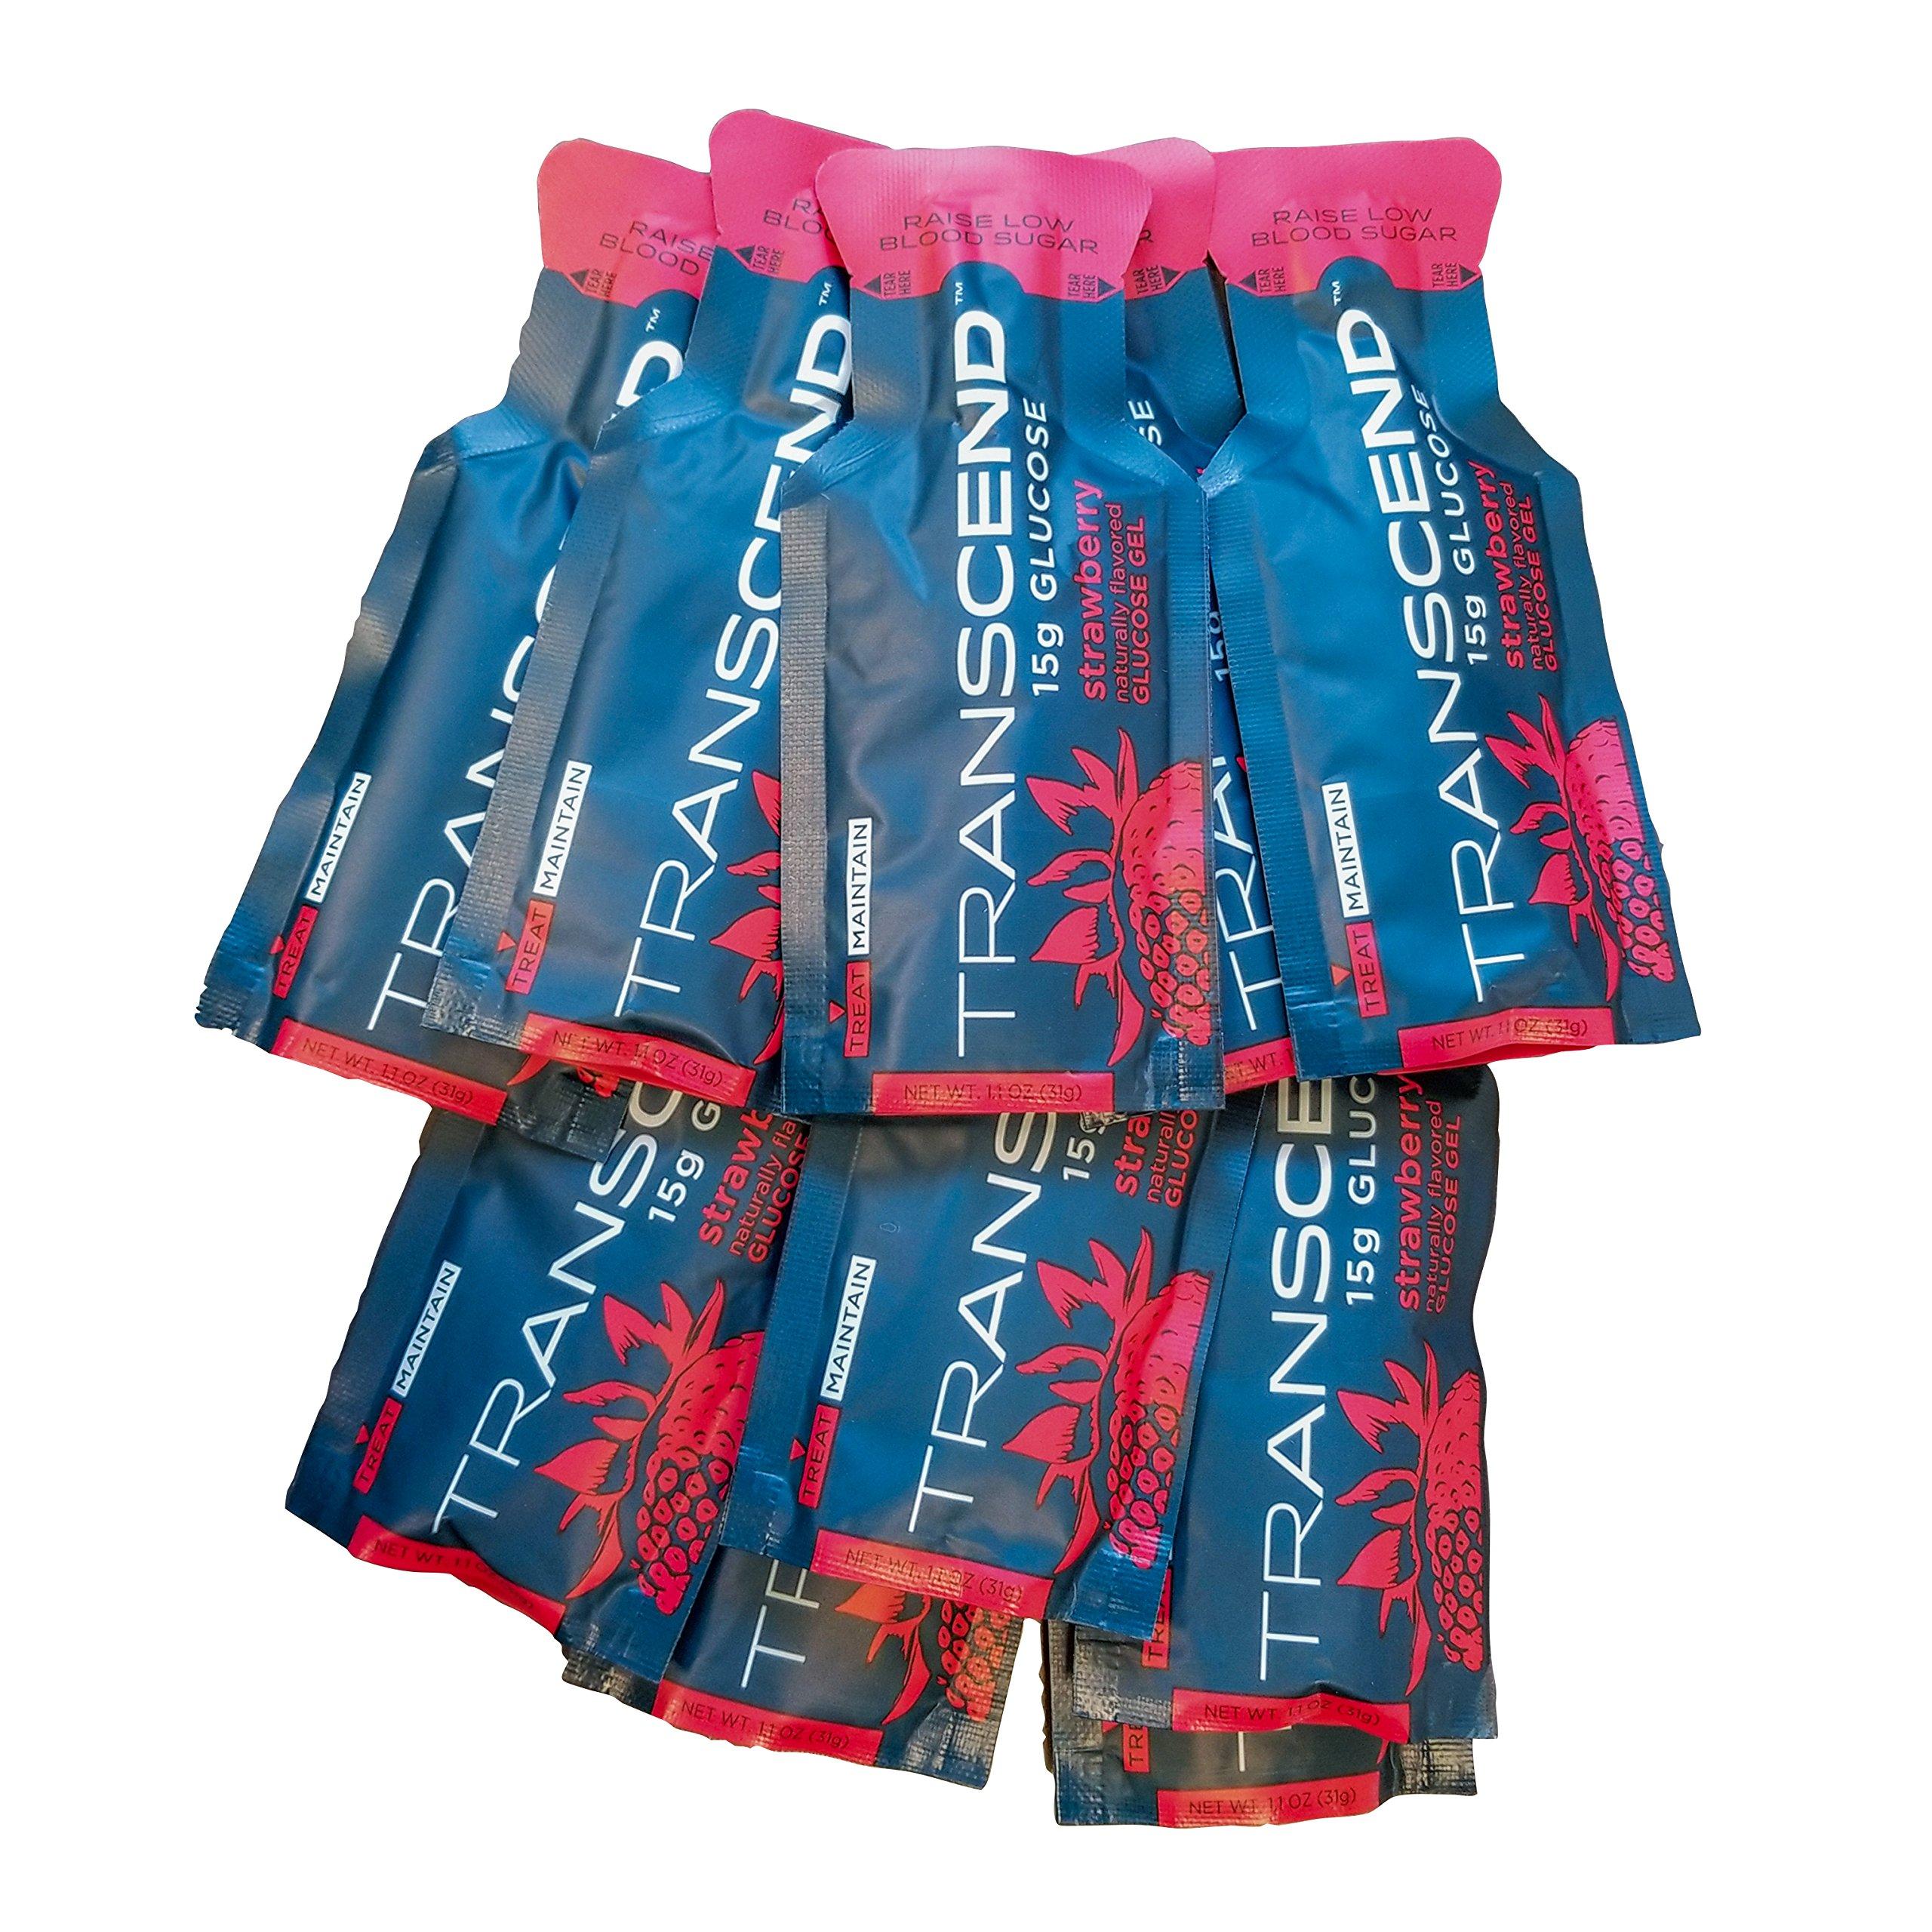 TRANSCEND 15g Strawberry Glucose Gel - 10 Pouch Bulk Pack